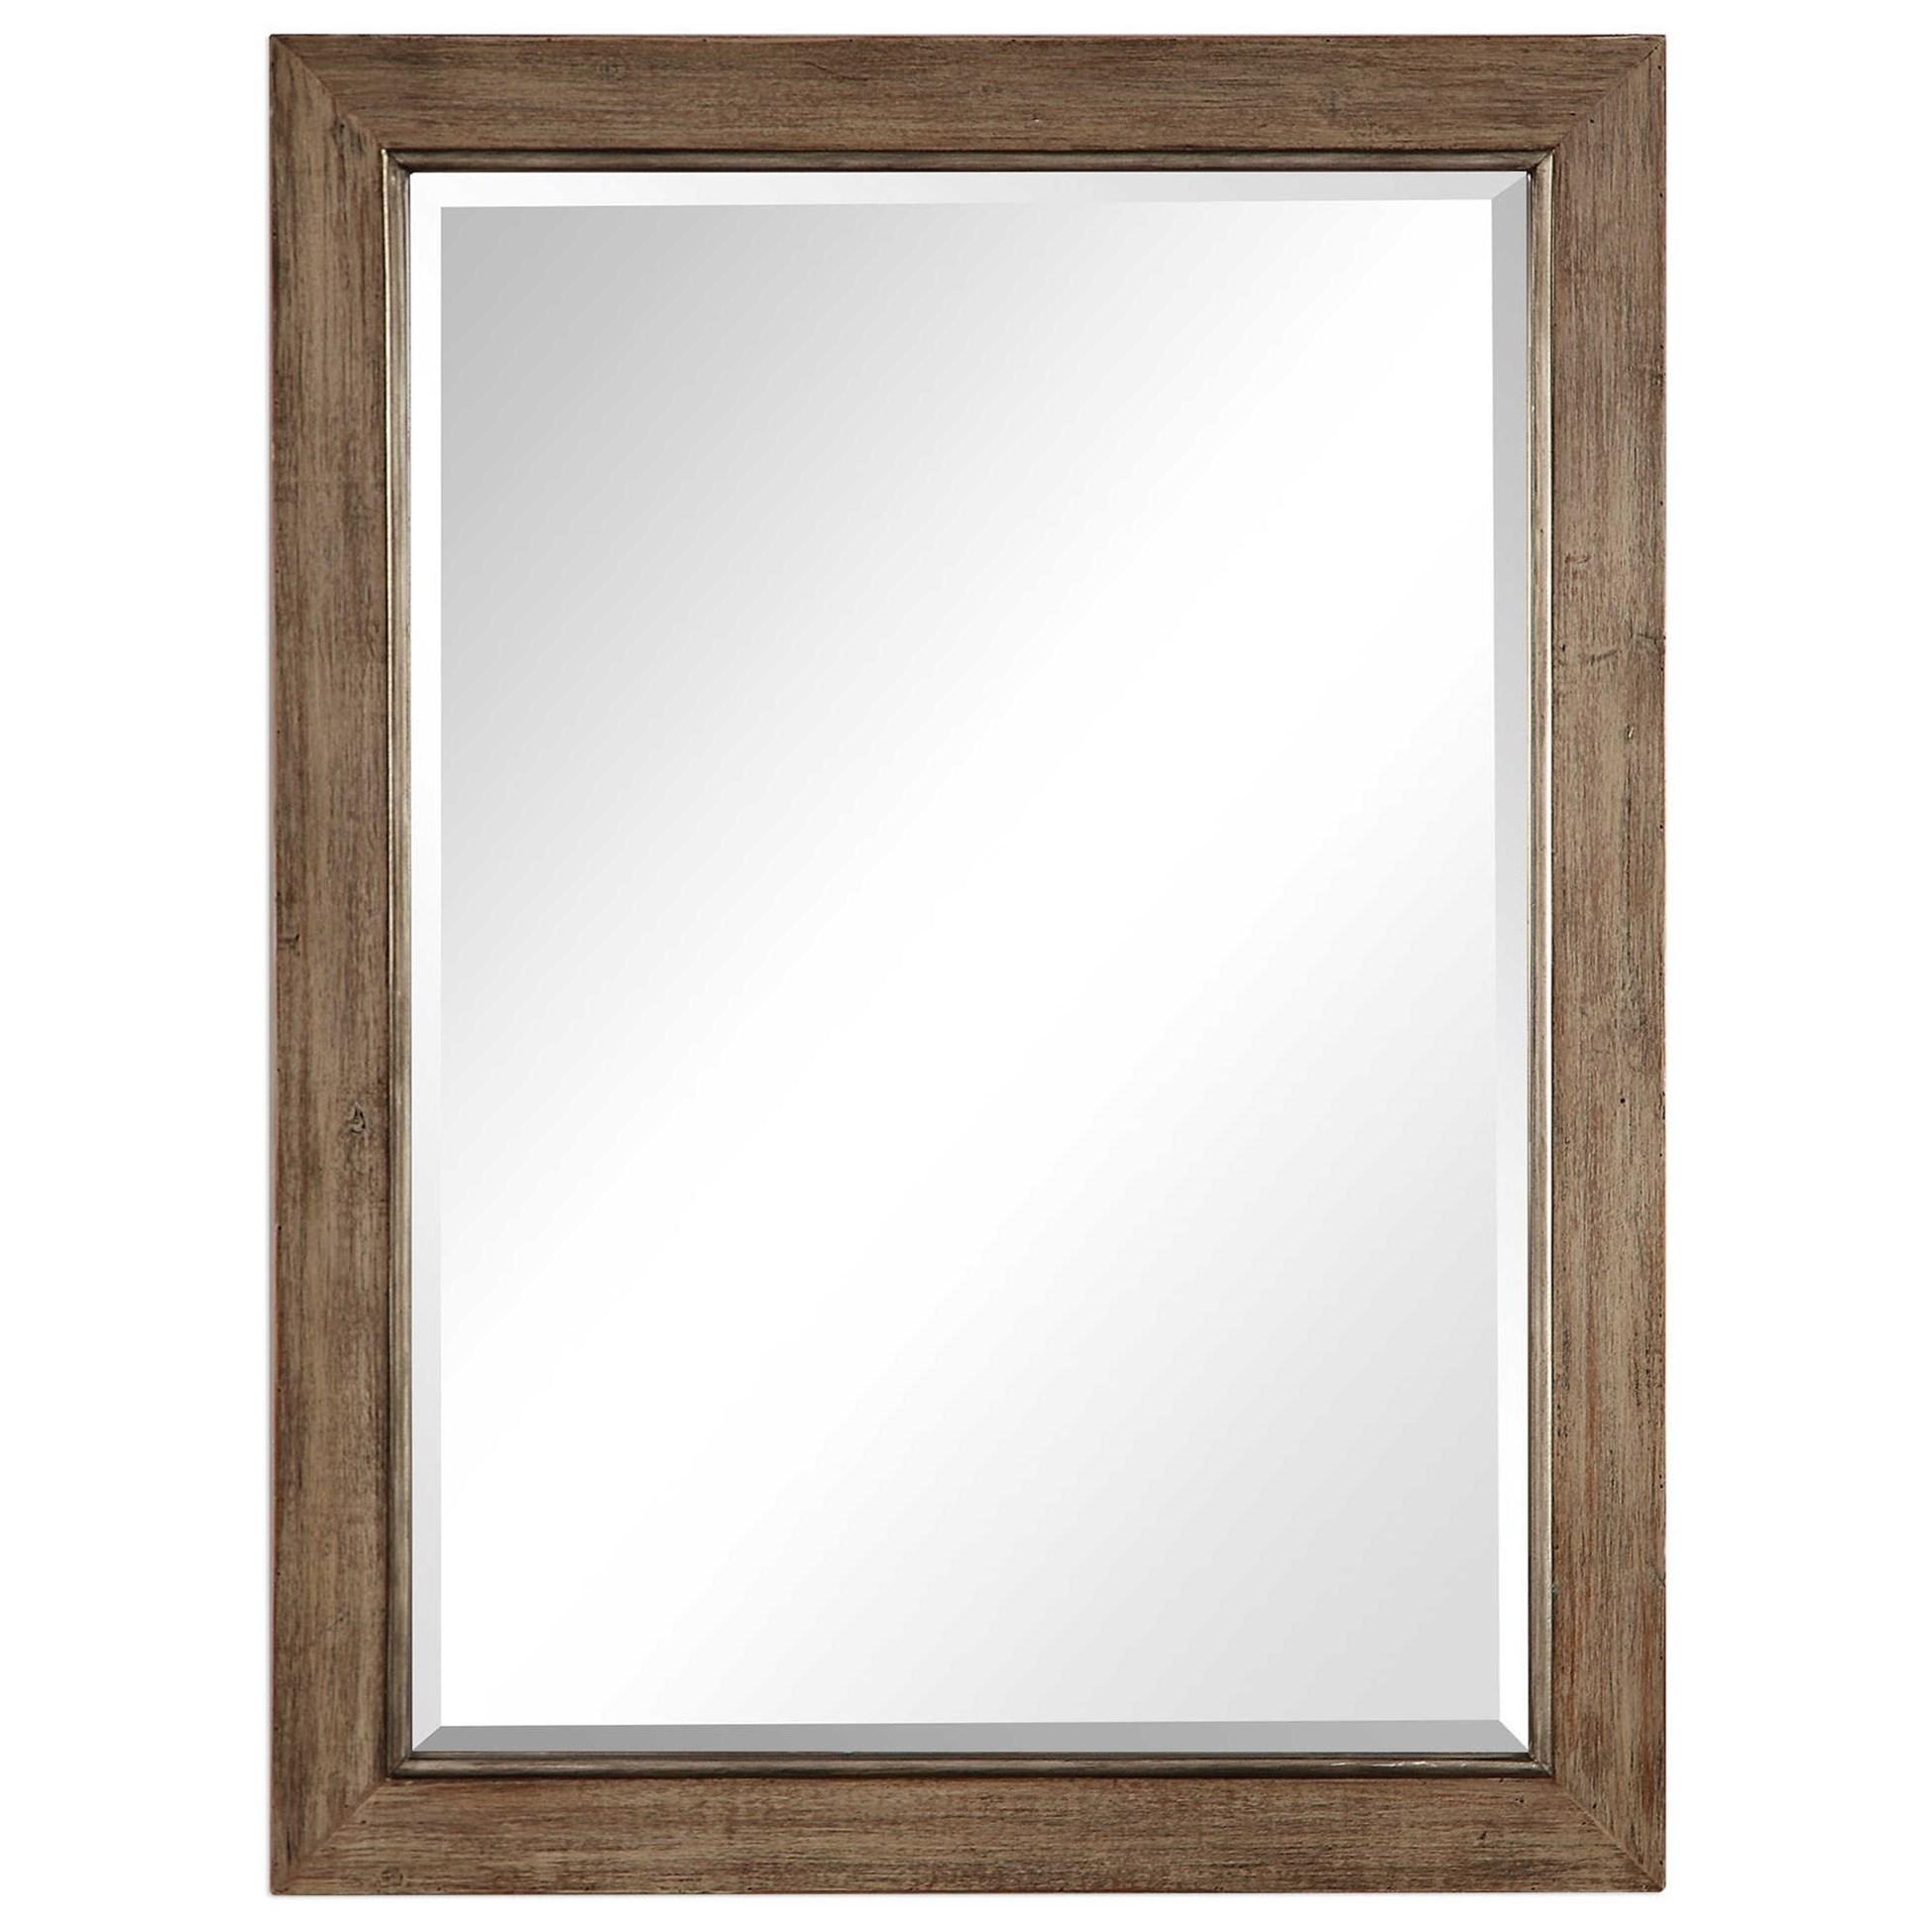 Mirrors Walt Farmhouse Mirror by Uttermost at Wayside Furniture